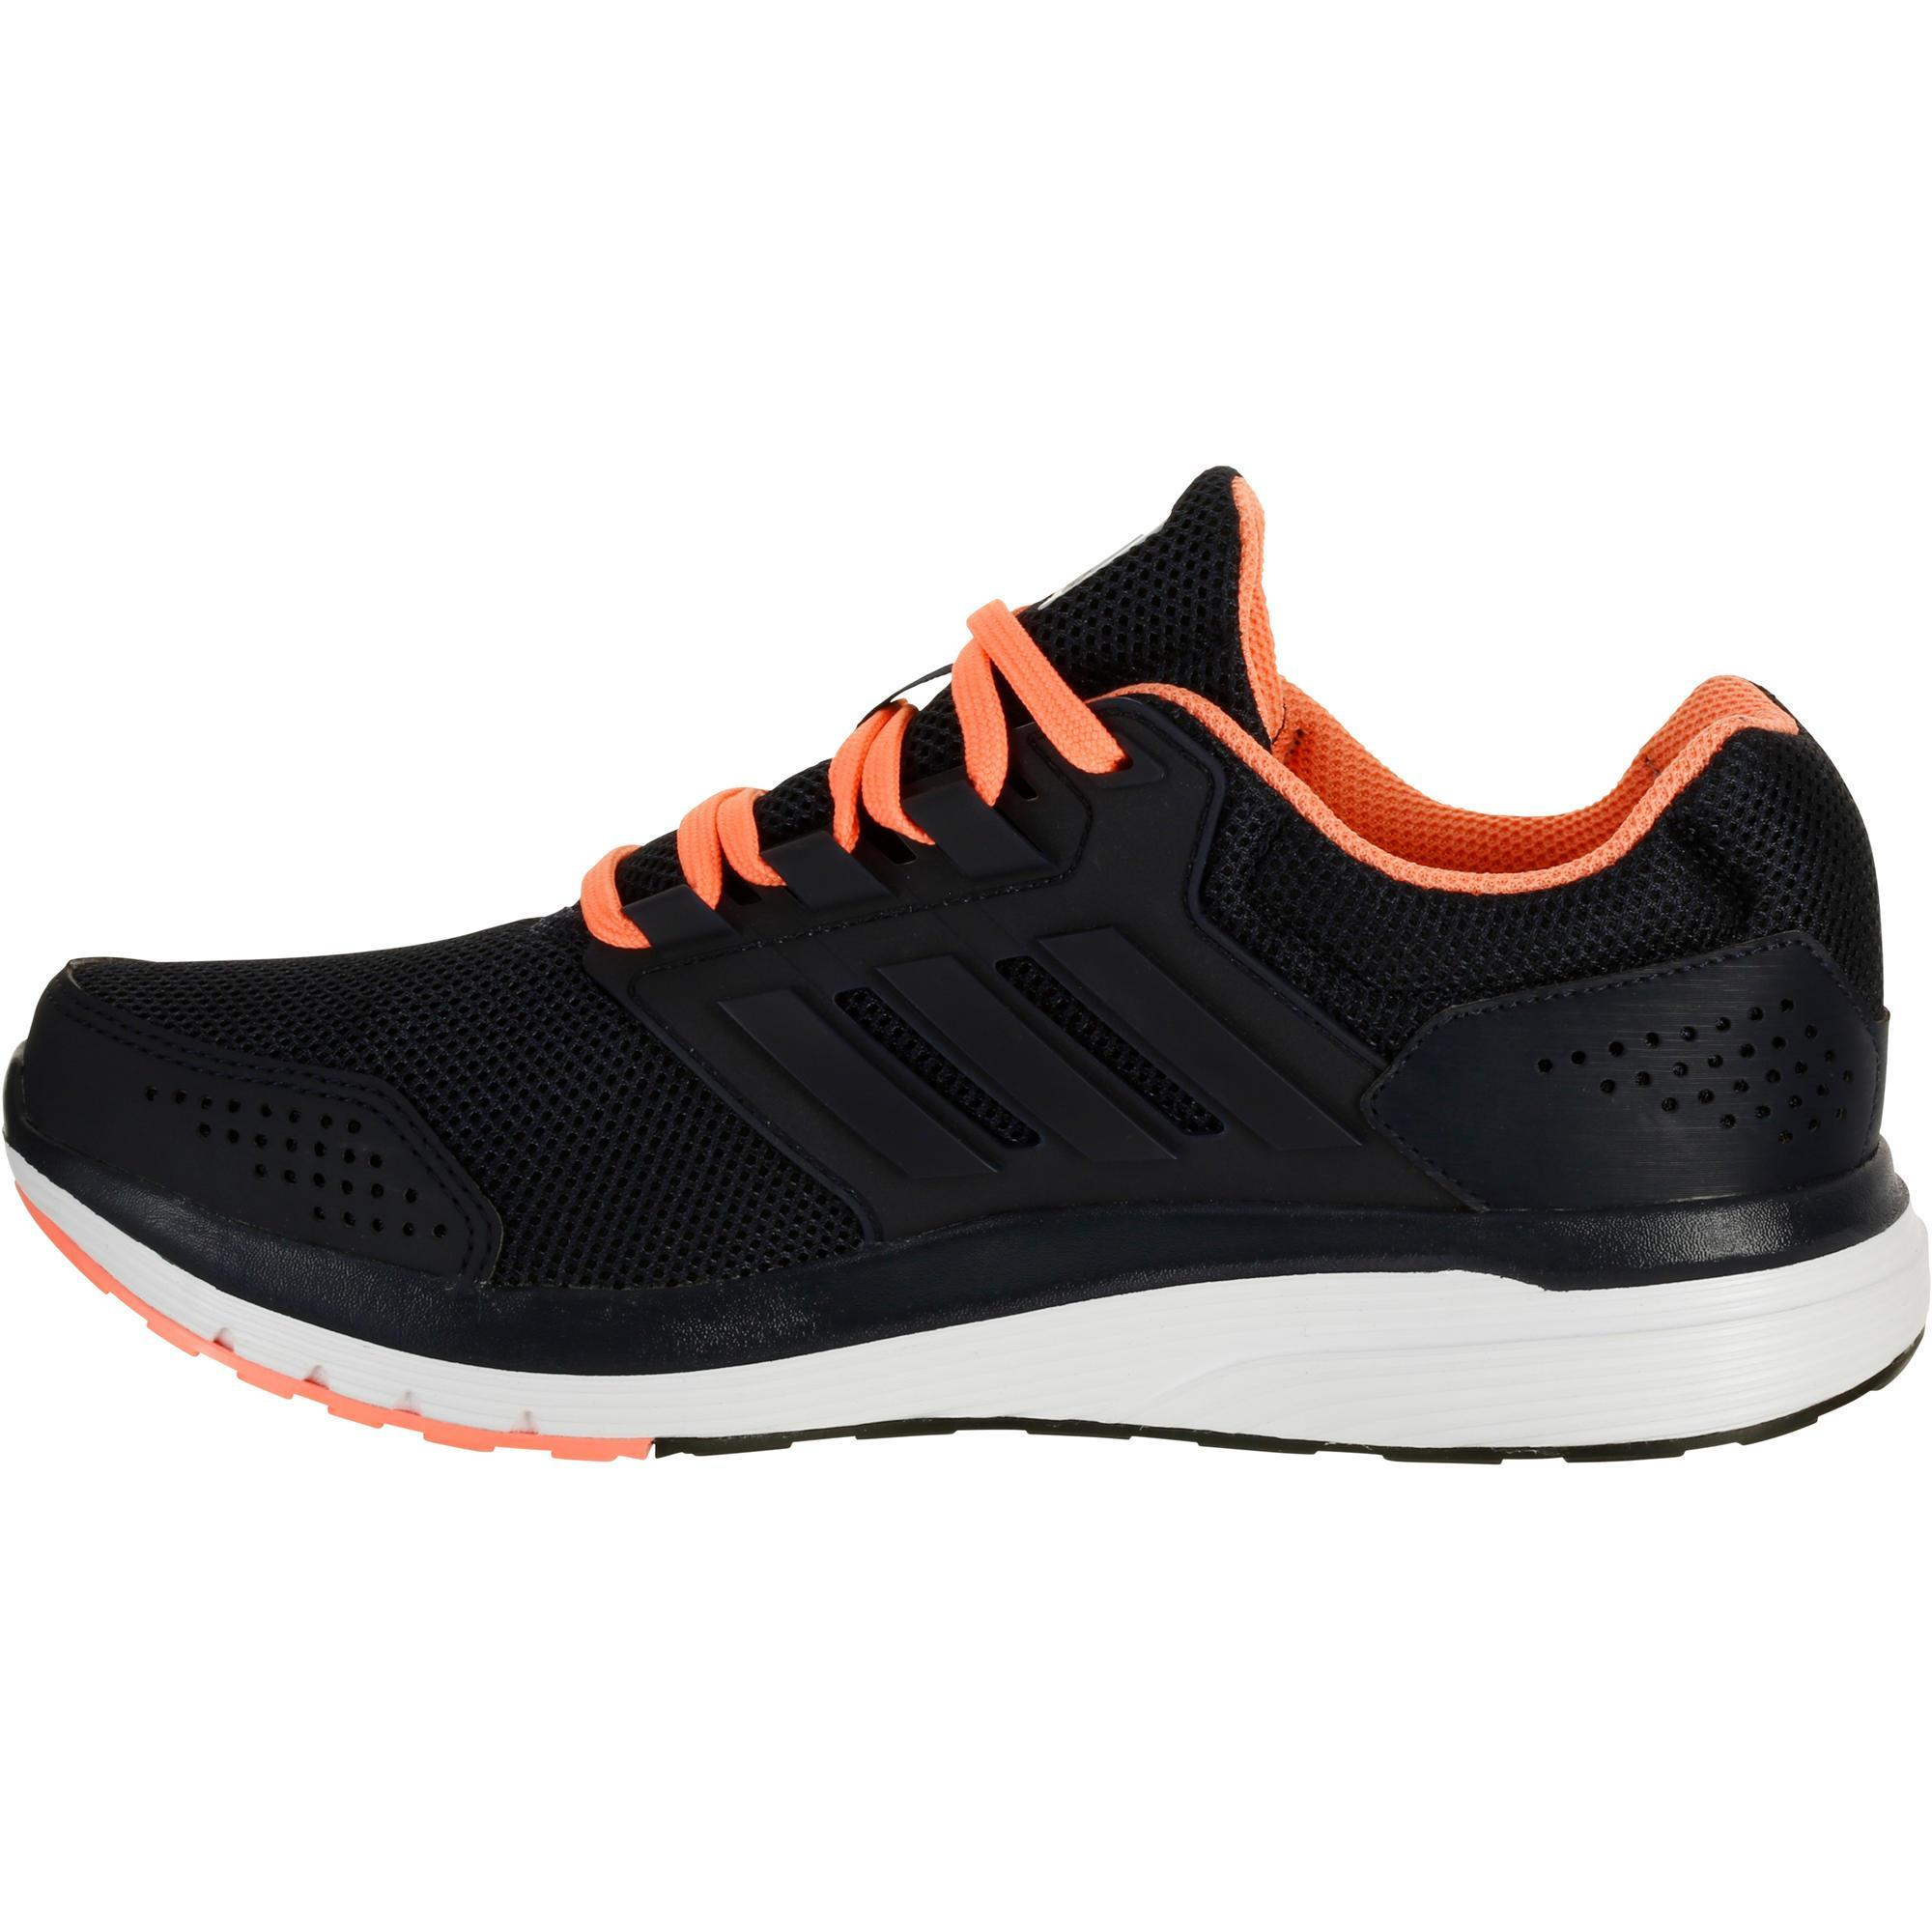 Pied Noir 4 Course Galaxy Jogging A Chaussures Wgtdeecq Adidas Femme qPRHHX 9ec27148442